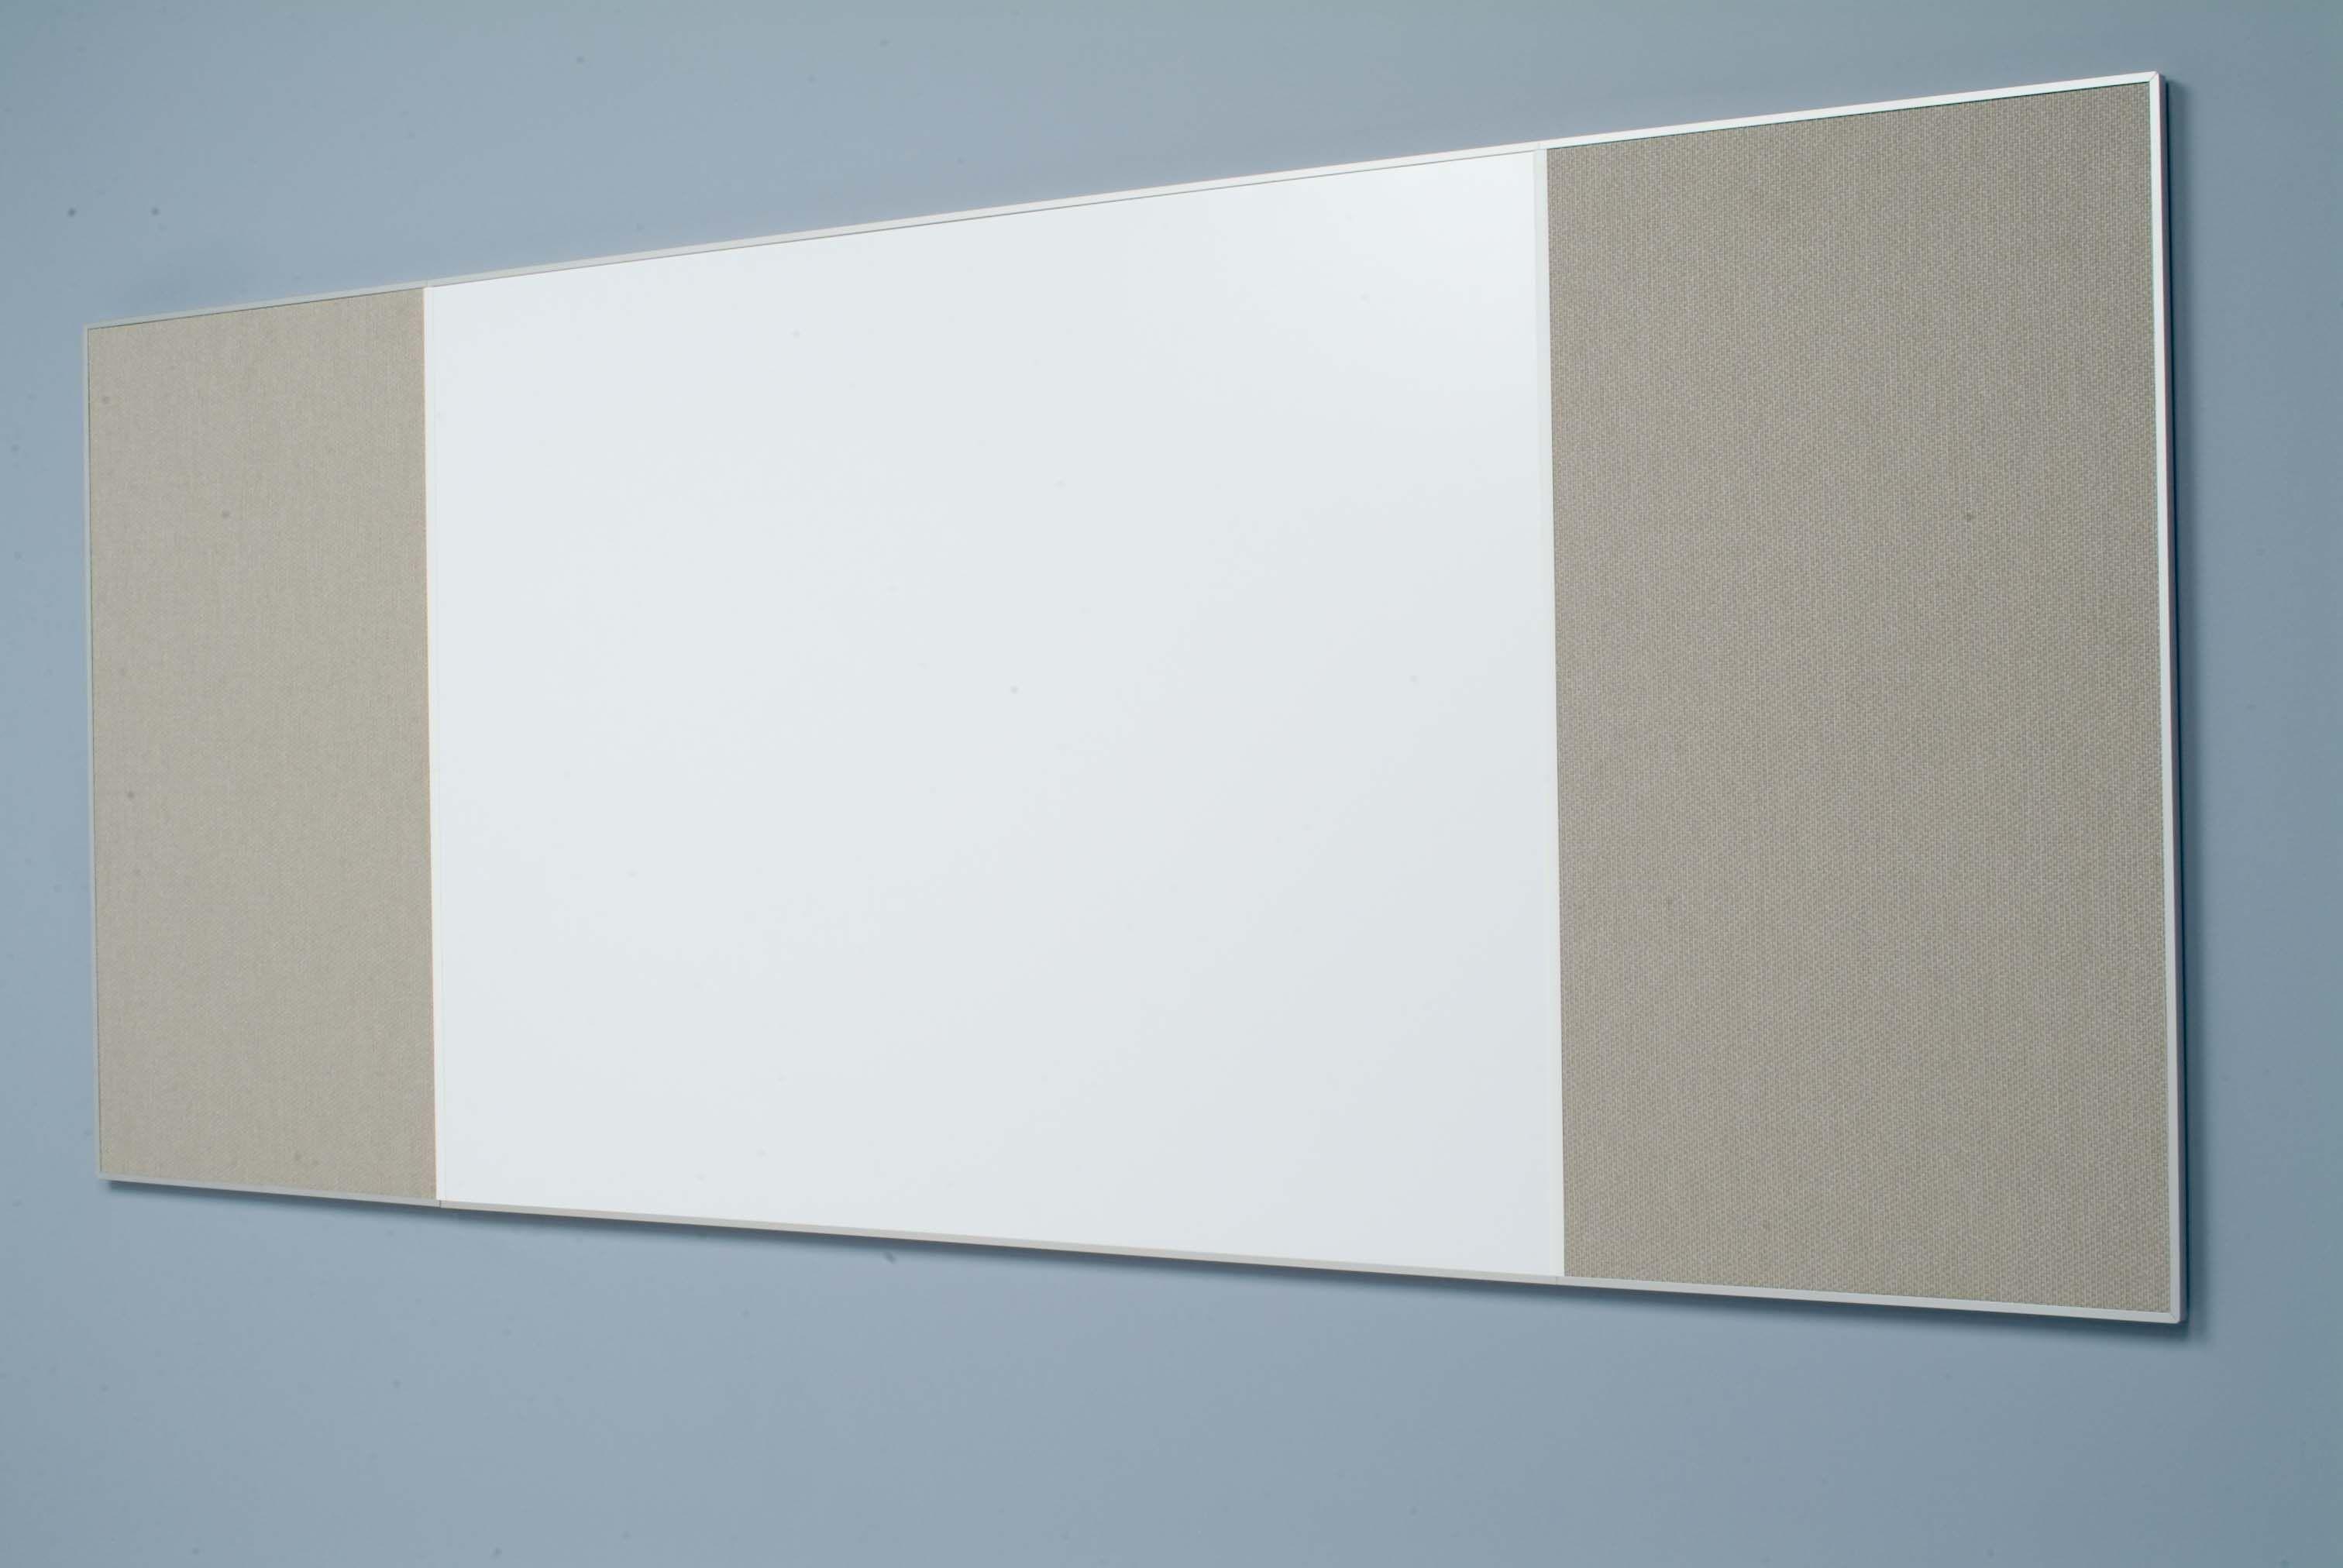 Egan Linked Aluminum Frame Markerboard/Tackboard